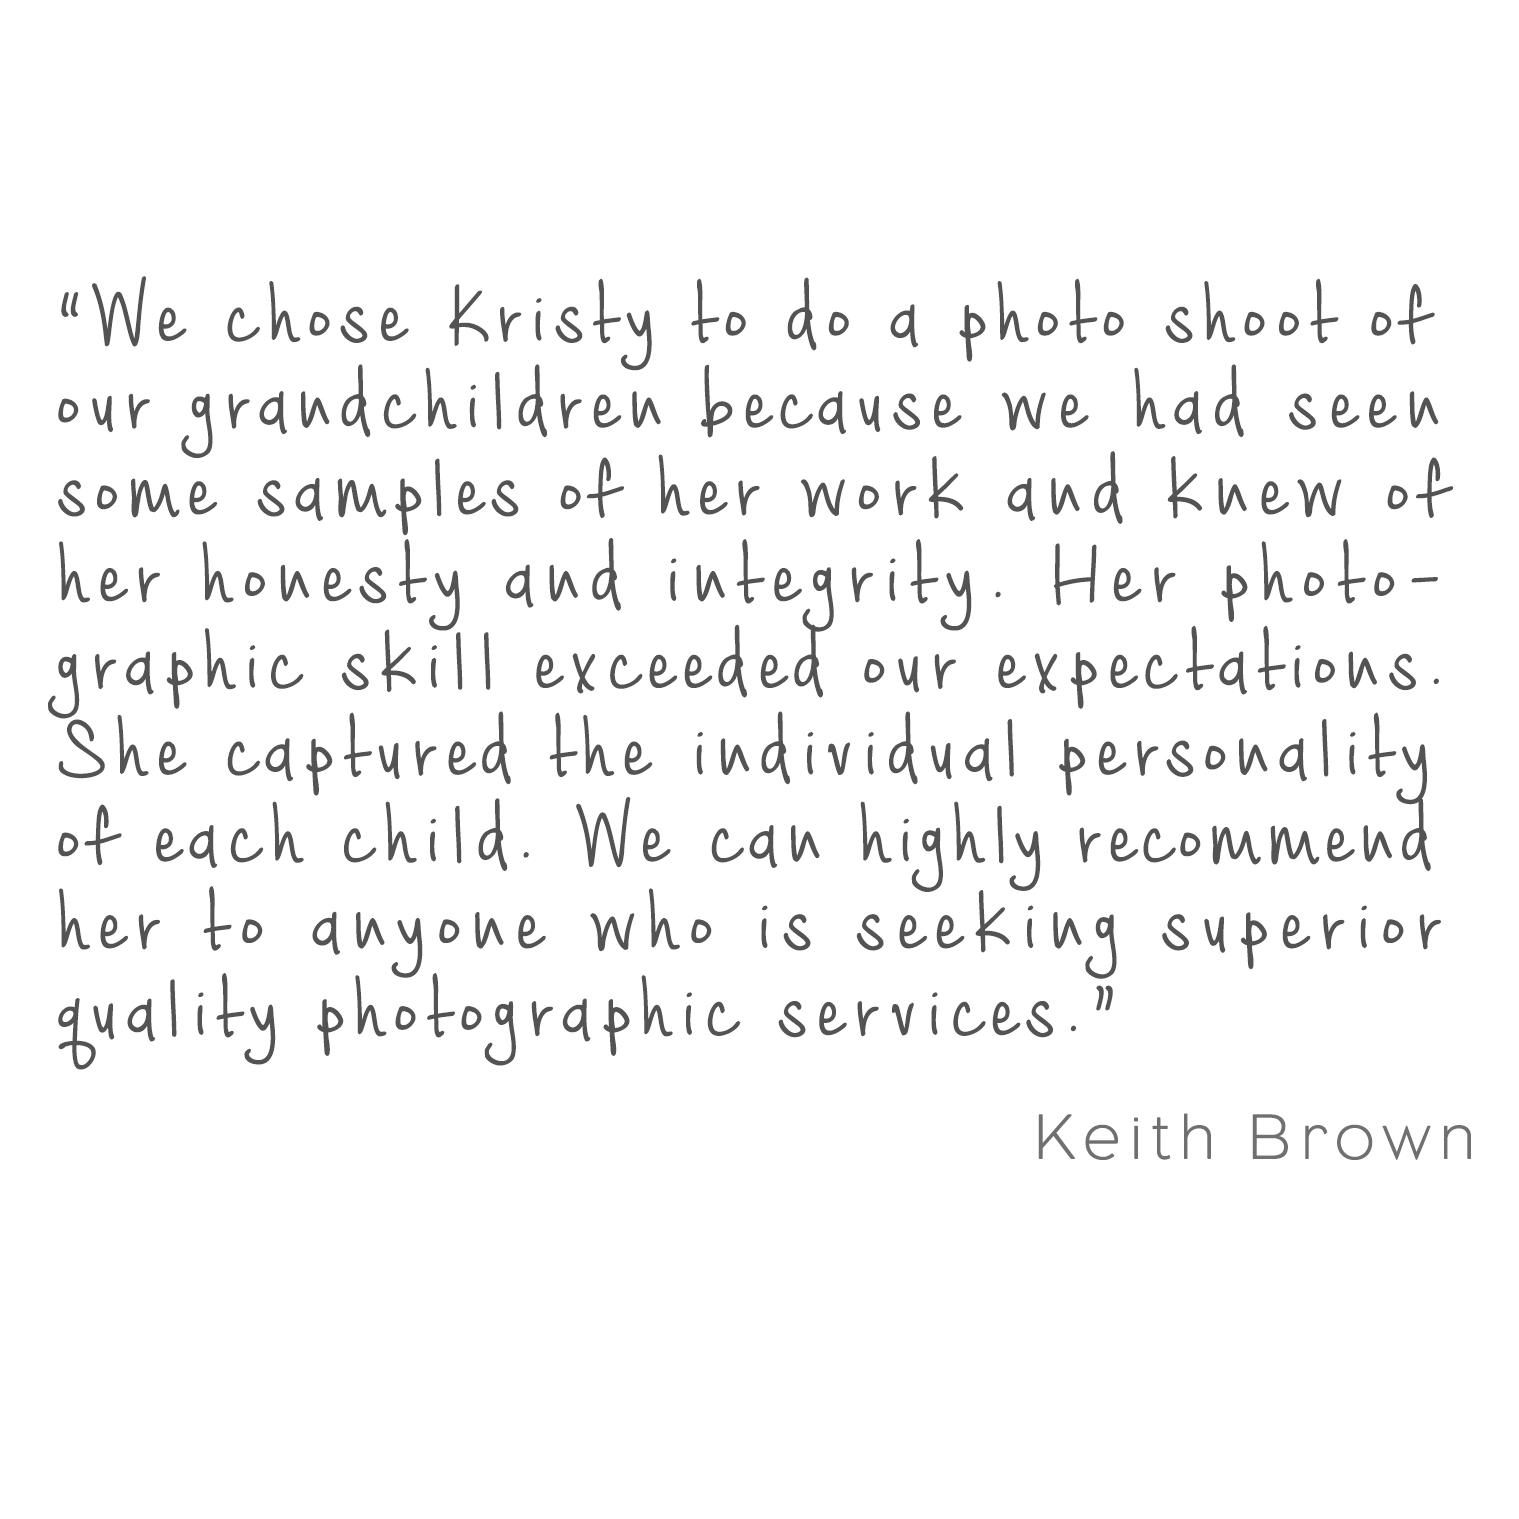 brown testimonial